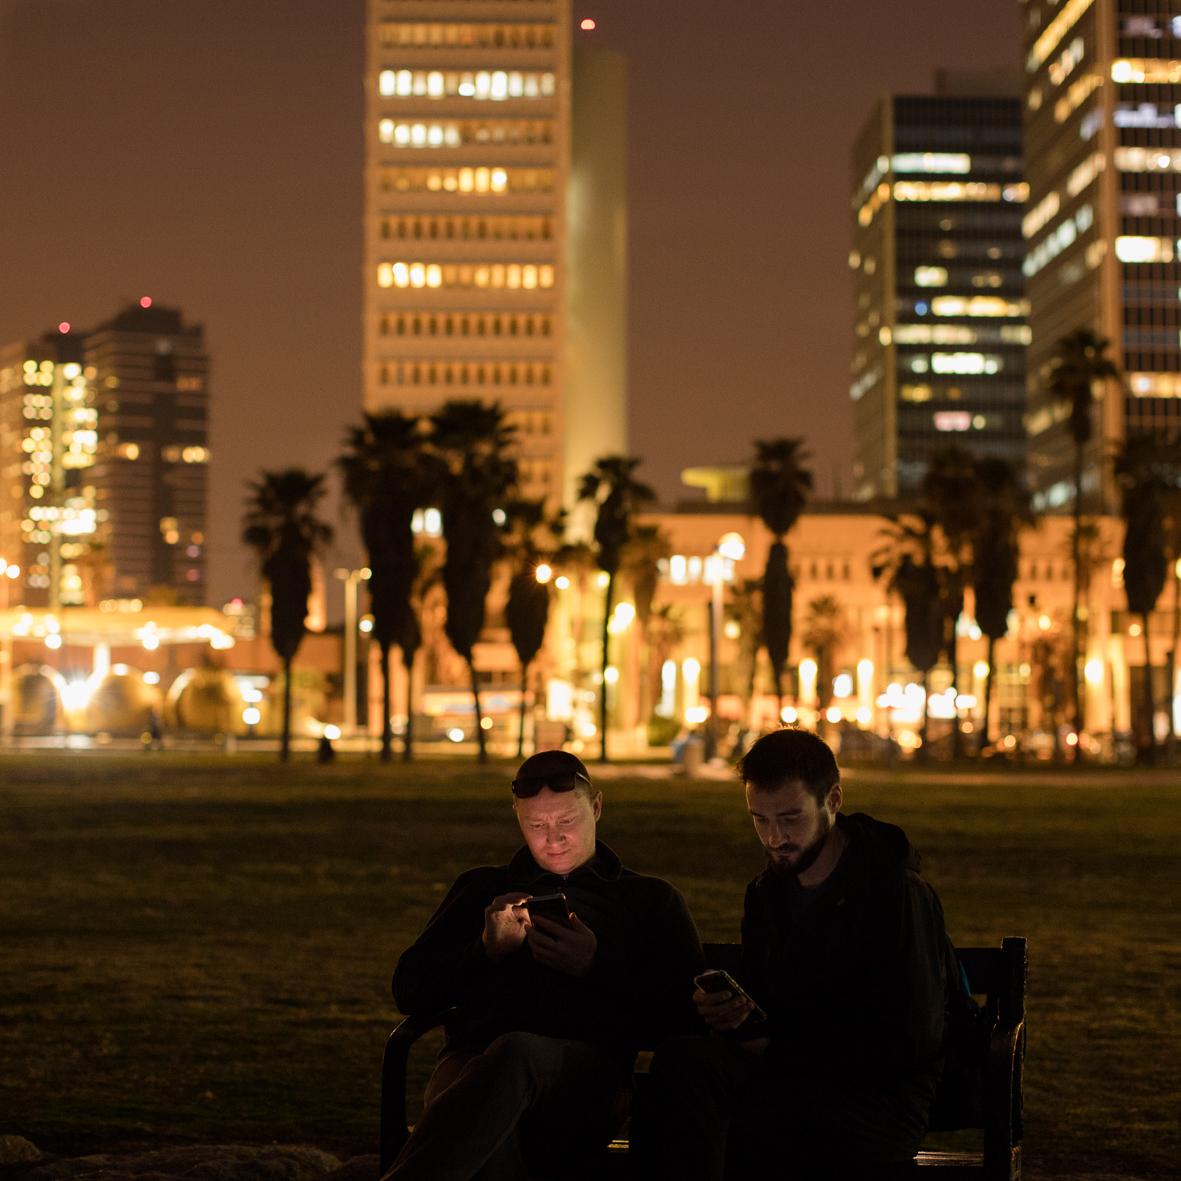 Auf Telefone starrende Männer, Tel Aviv